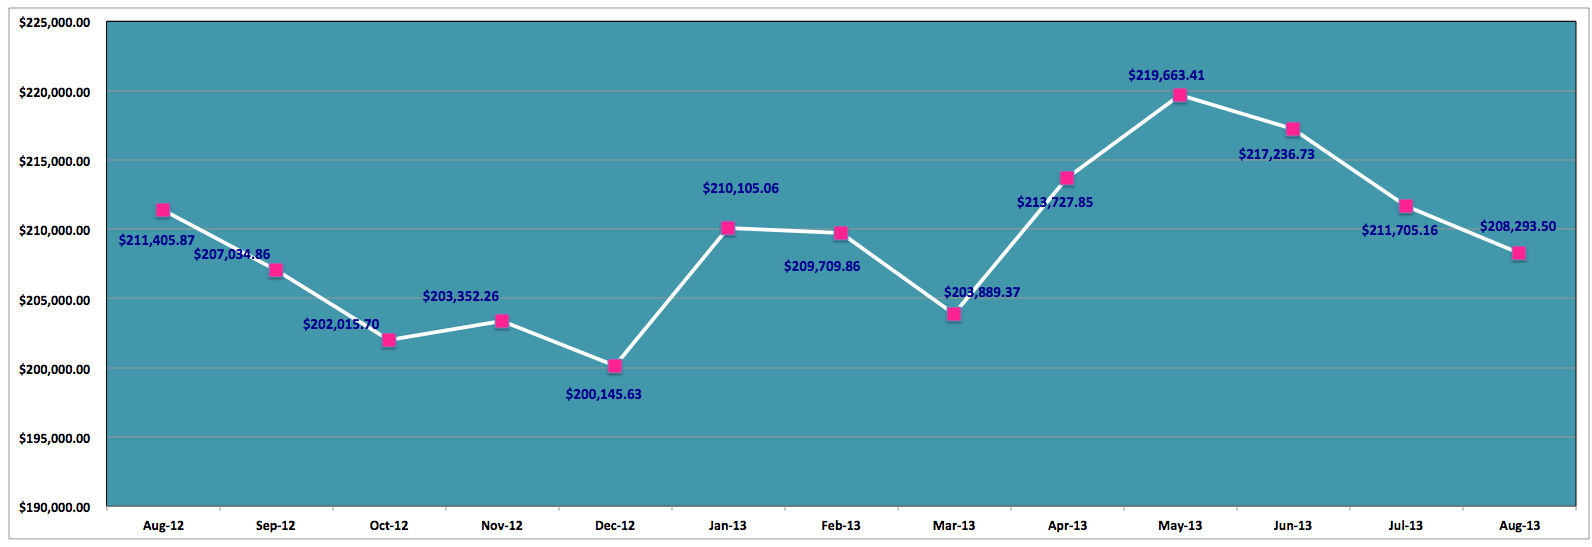 Save-Spend-Splurge-August-2013-Net-Worth-Past-12-Months